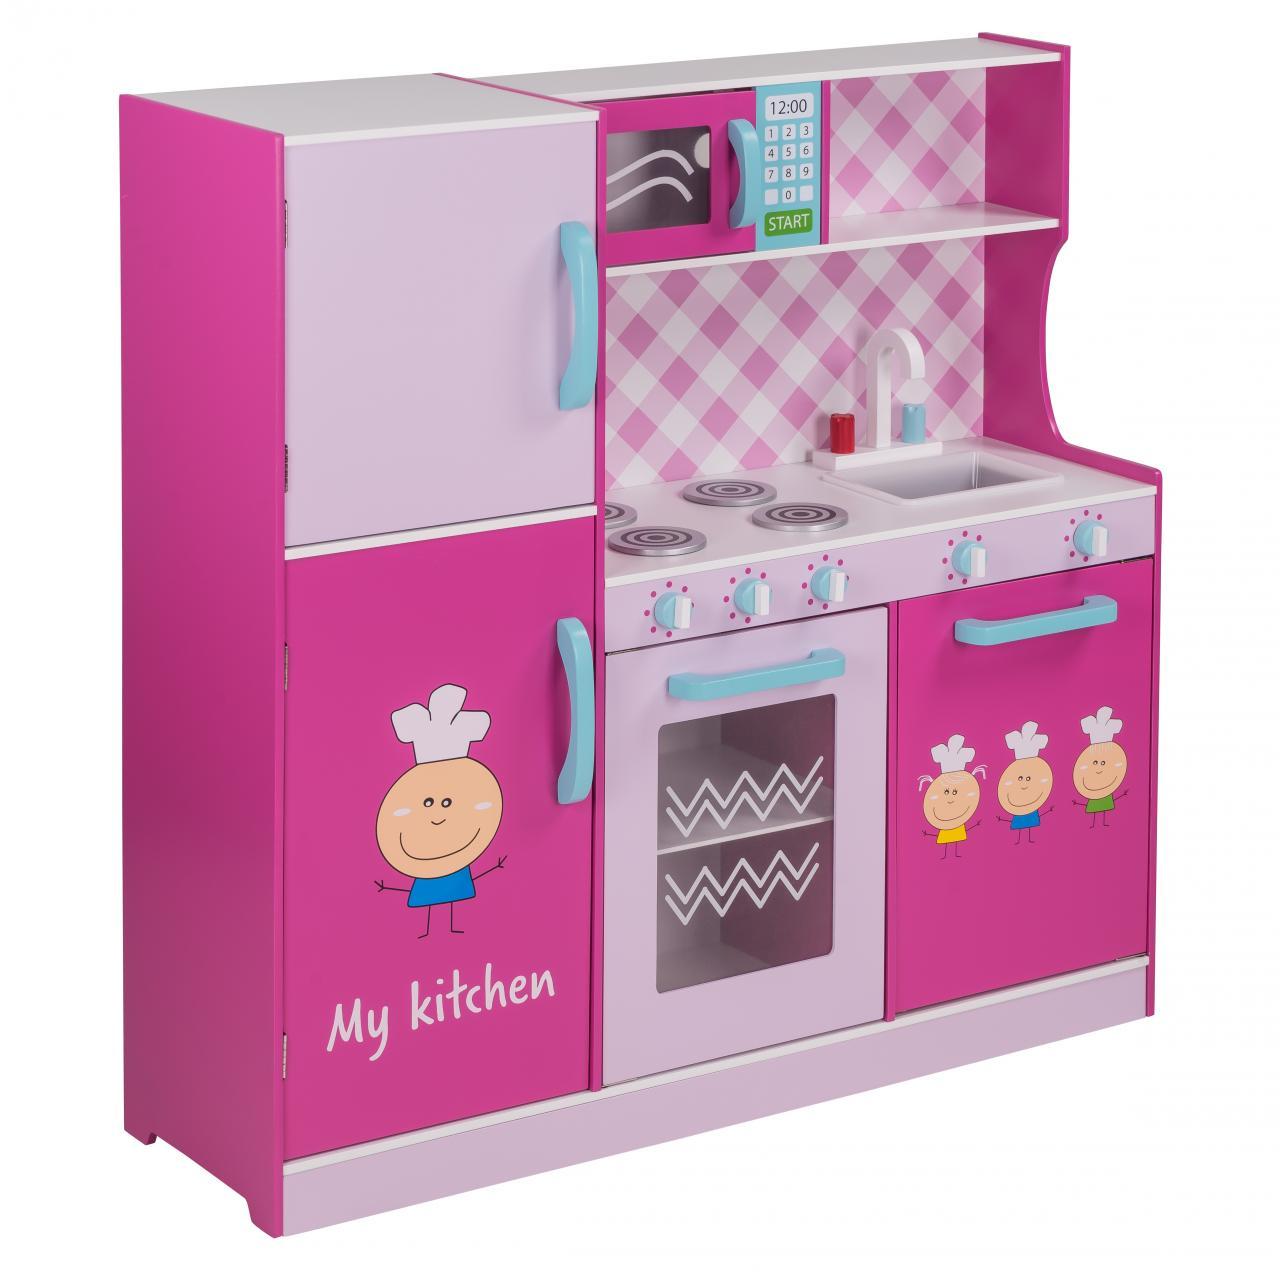 holzküche: spielzeug   ebay